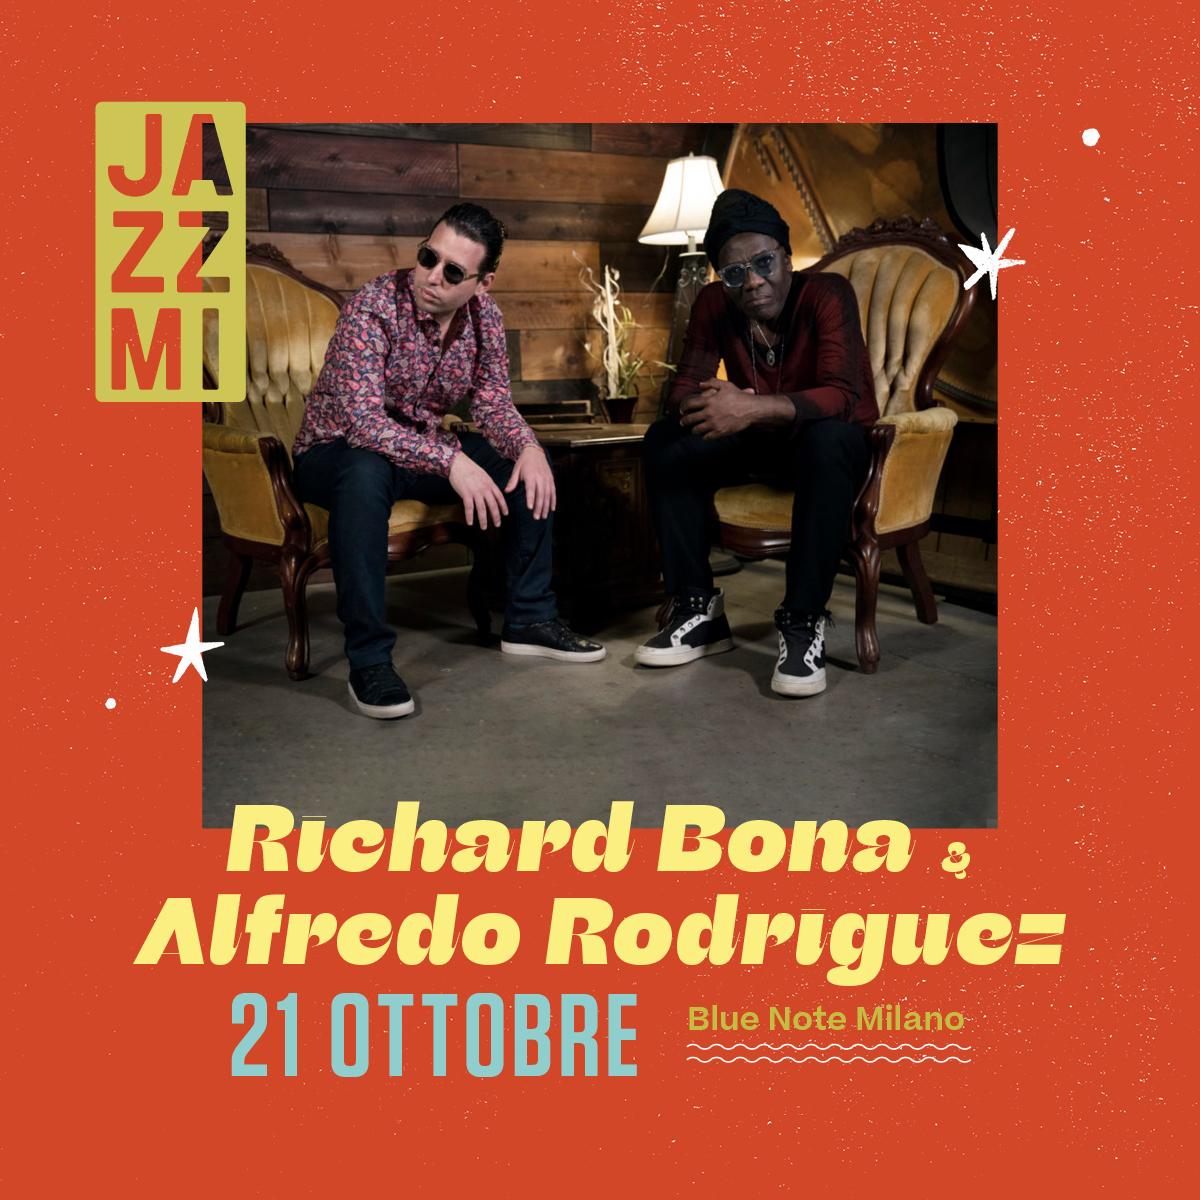 JAZZMI Richard Bona & Alfredo Rodriguez 21/10/2021 20.30